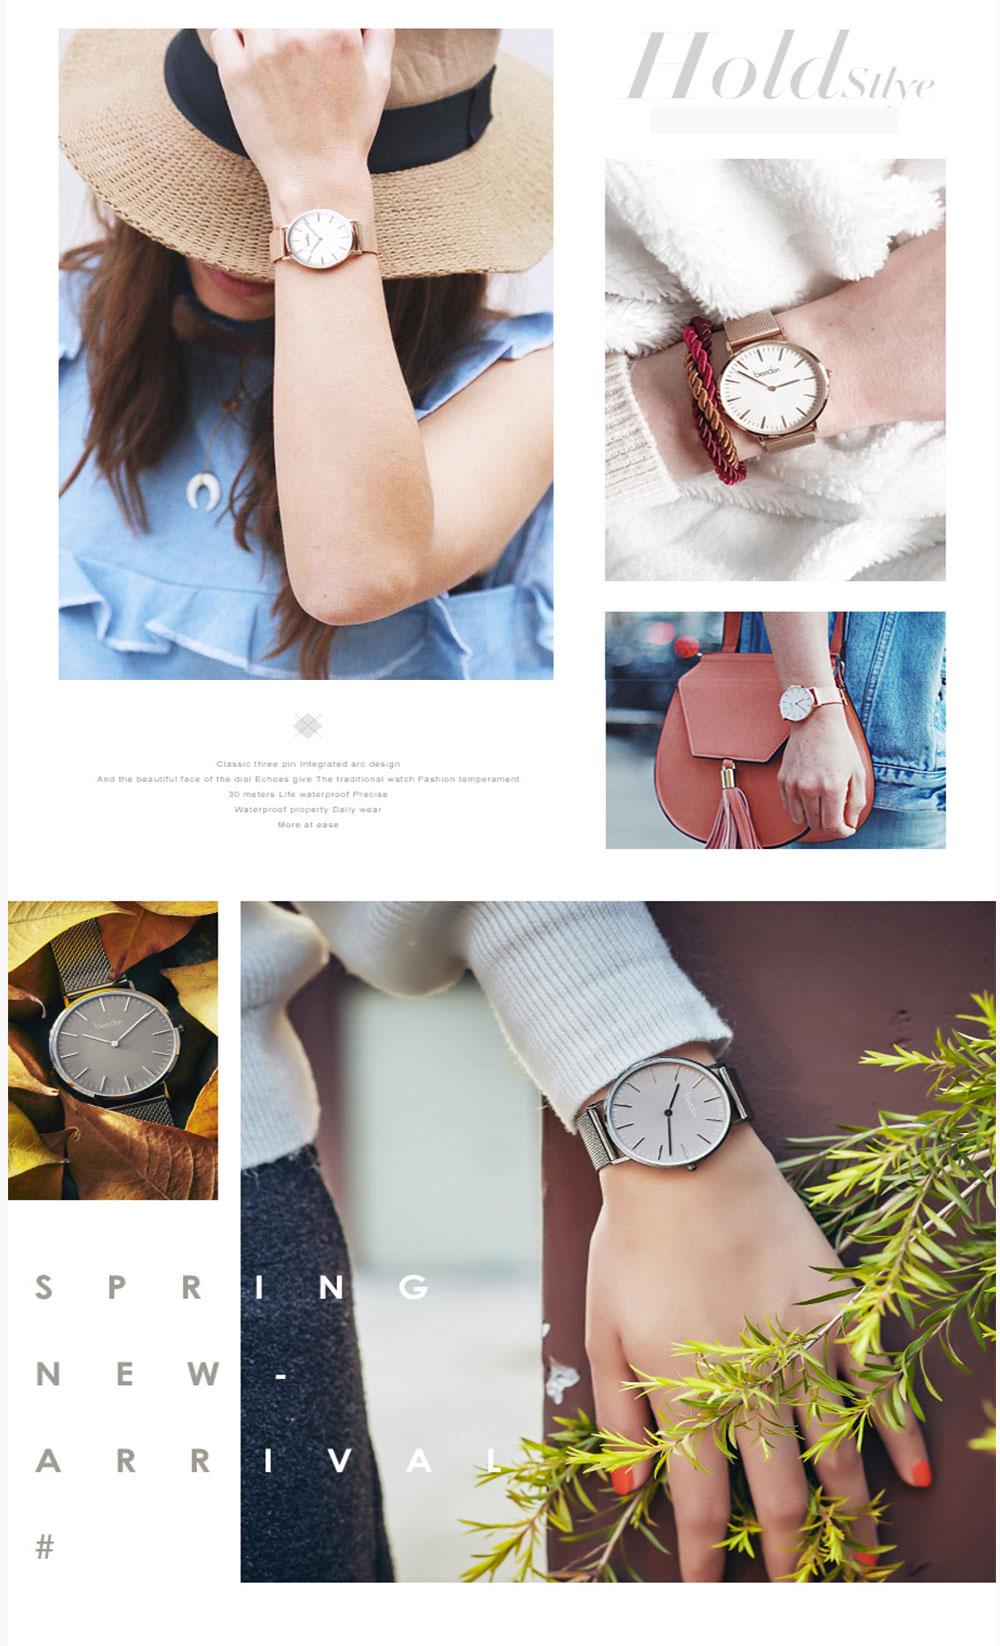 relógios minimalista unisex moda 2019 marca de